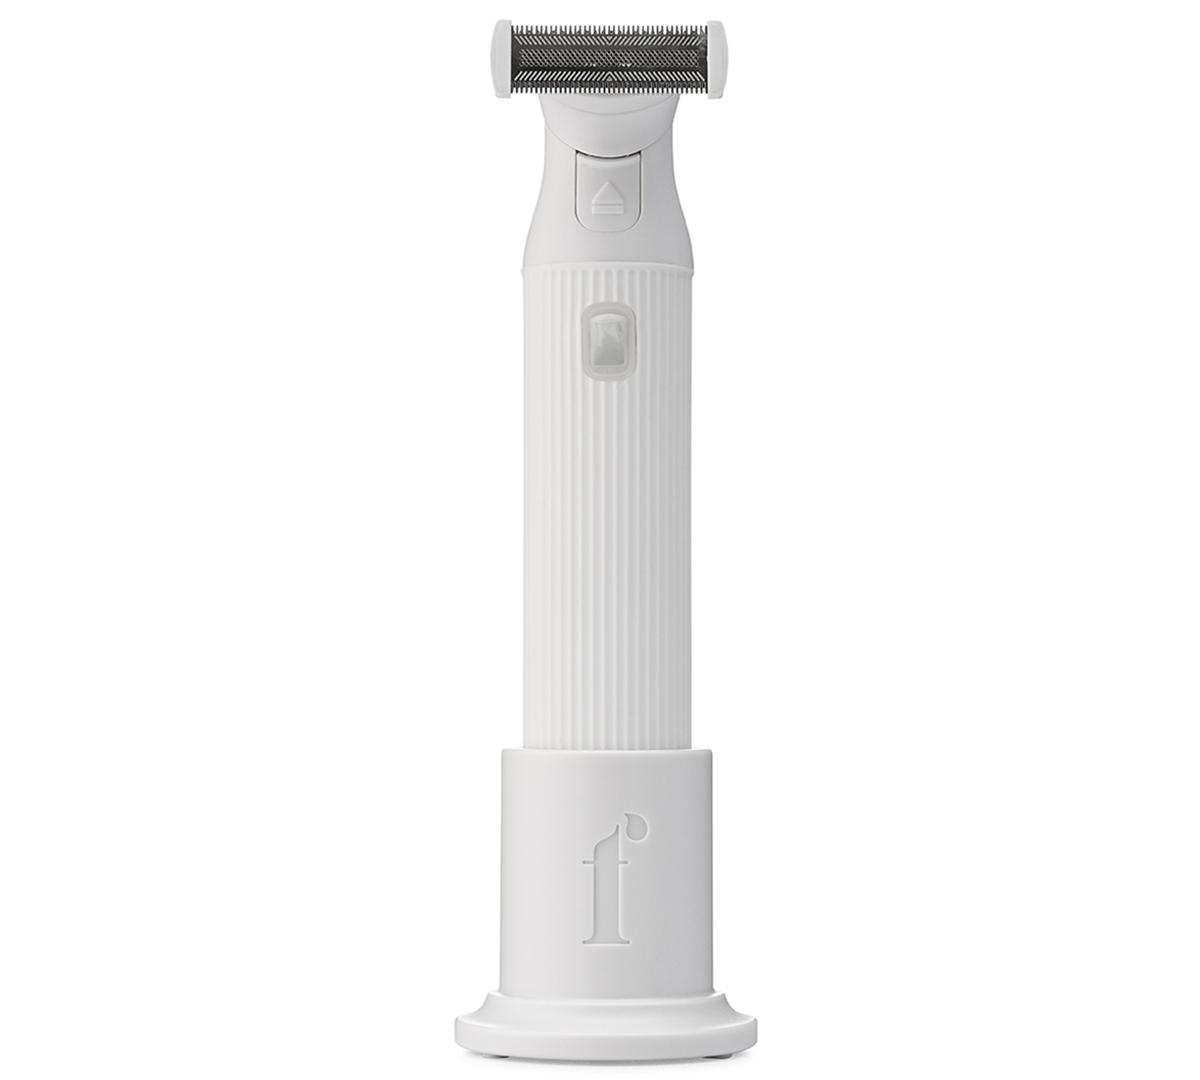 fur 8-Pc. Fur Trimmer Shaving & Grooming Set